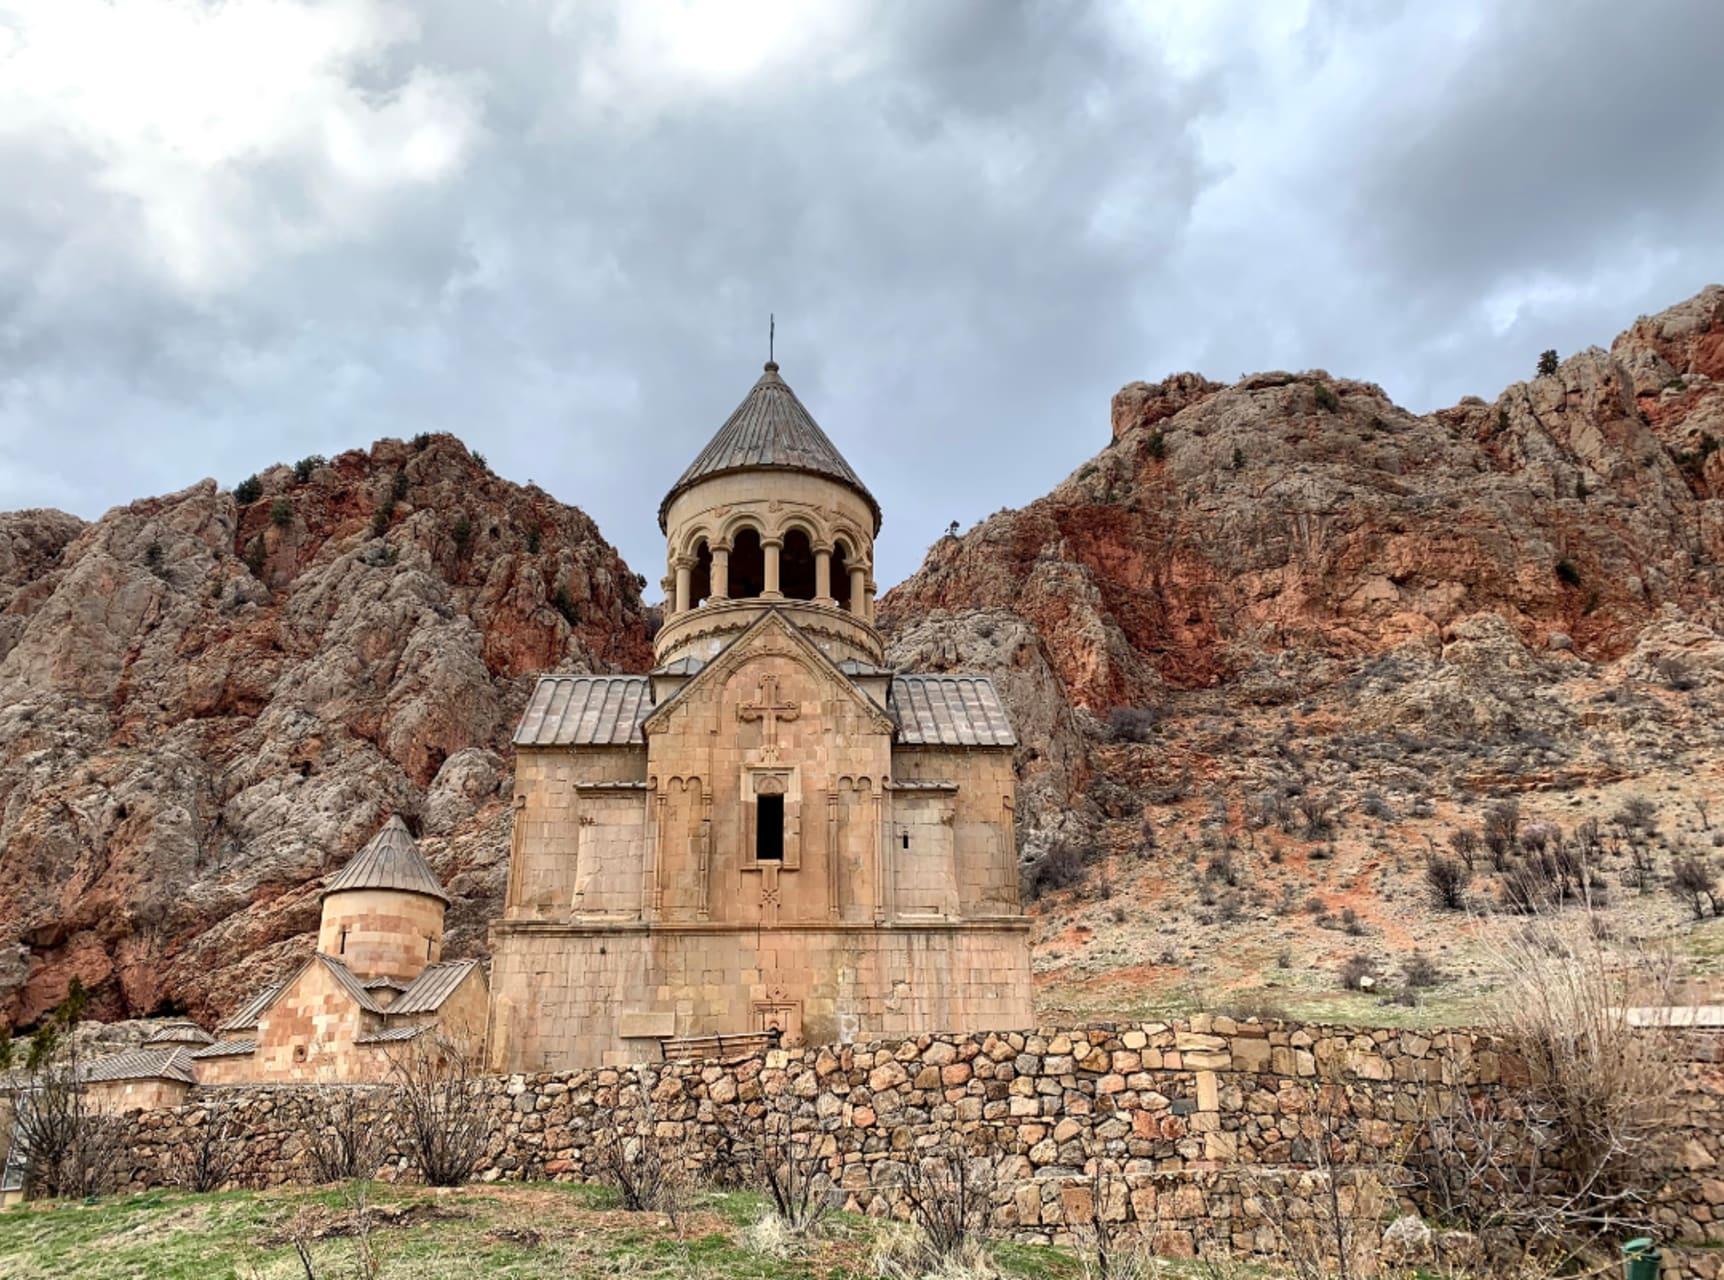 Yerevan - Explore a Medieval Armenian Monastery in the Mountains